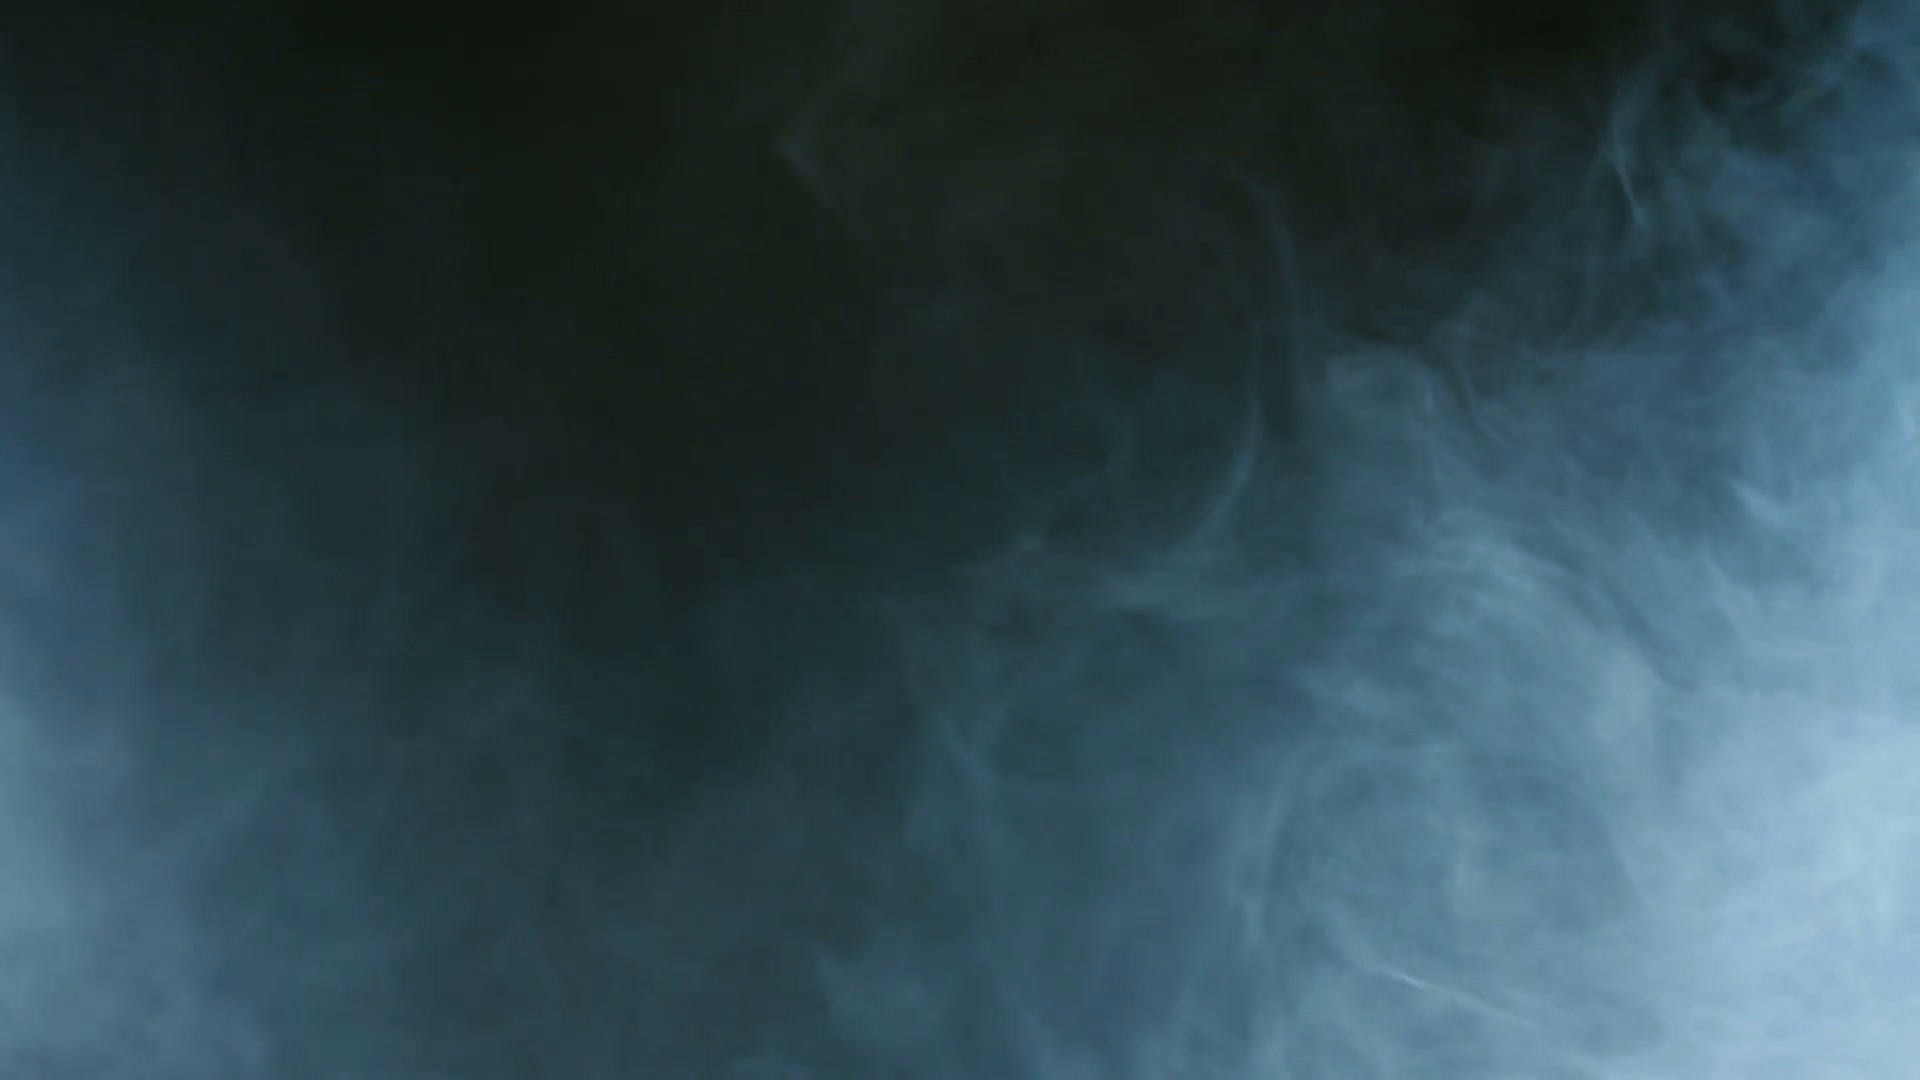 Blue smoke on black background. Cigarette smoke. Smoke effect. Fog  background. Abstract smoke cloud in slow motion. Smoke in studio blue light.